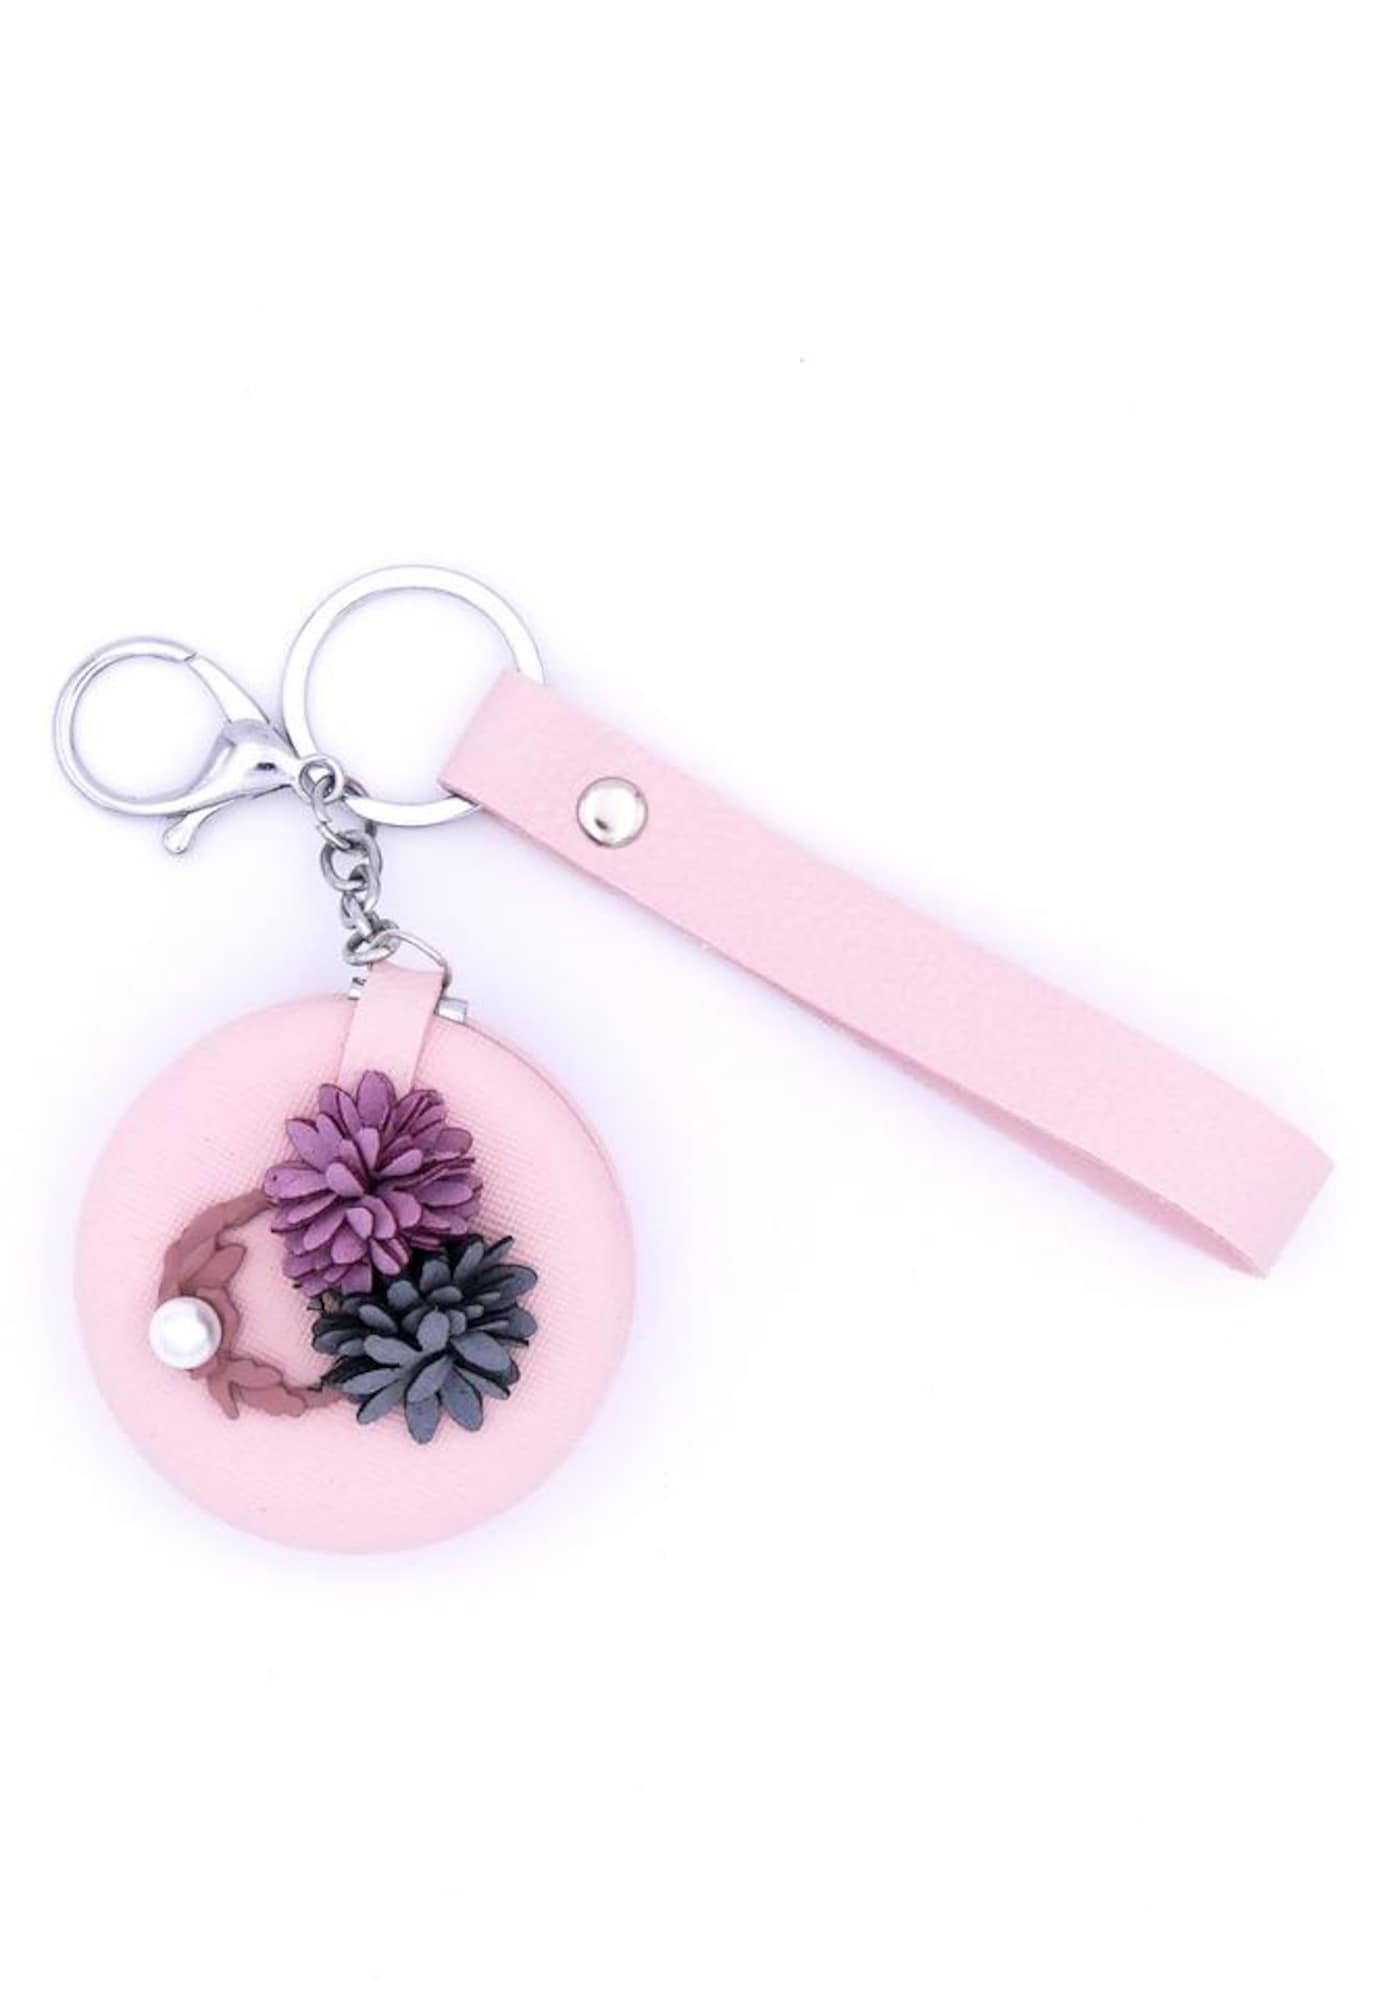 Schlüsselanhänger | Accessoires > Schlüsselanhänger | J. Jayz